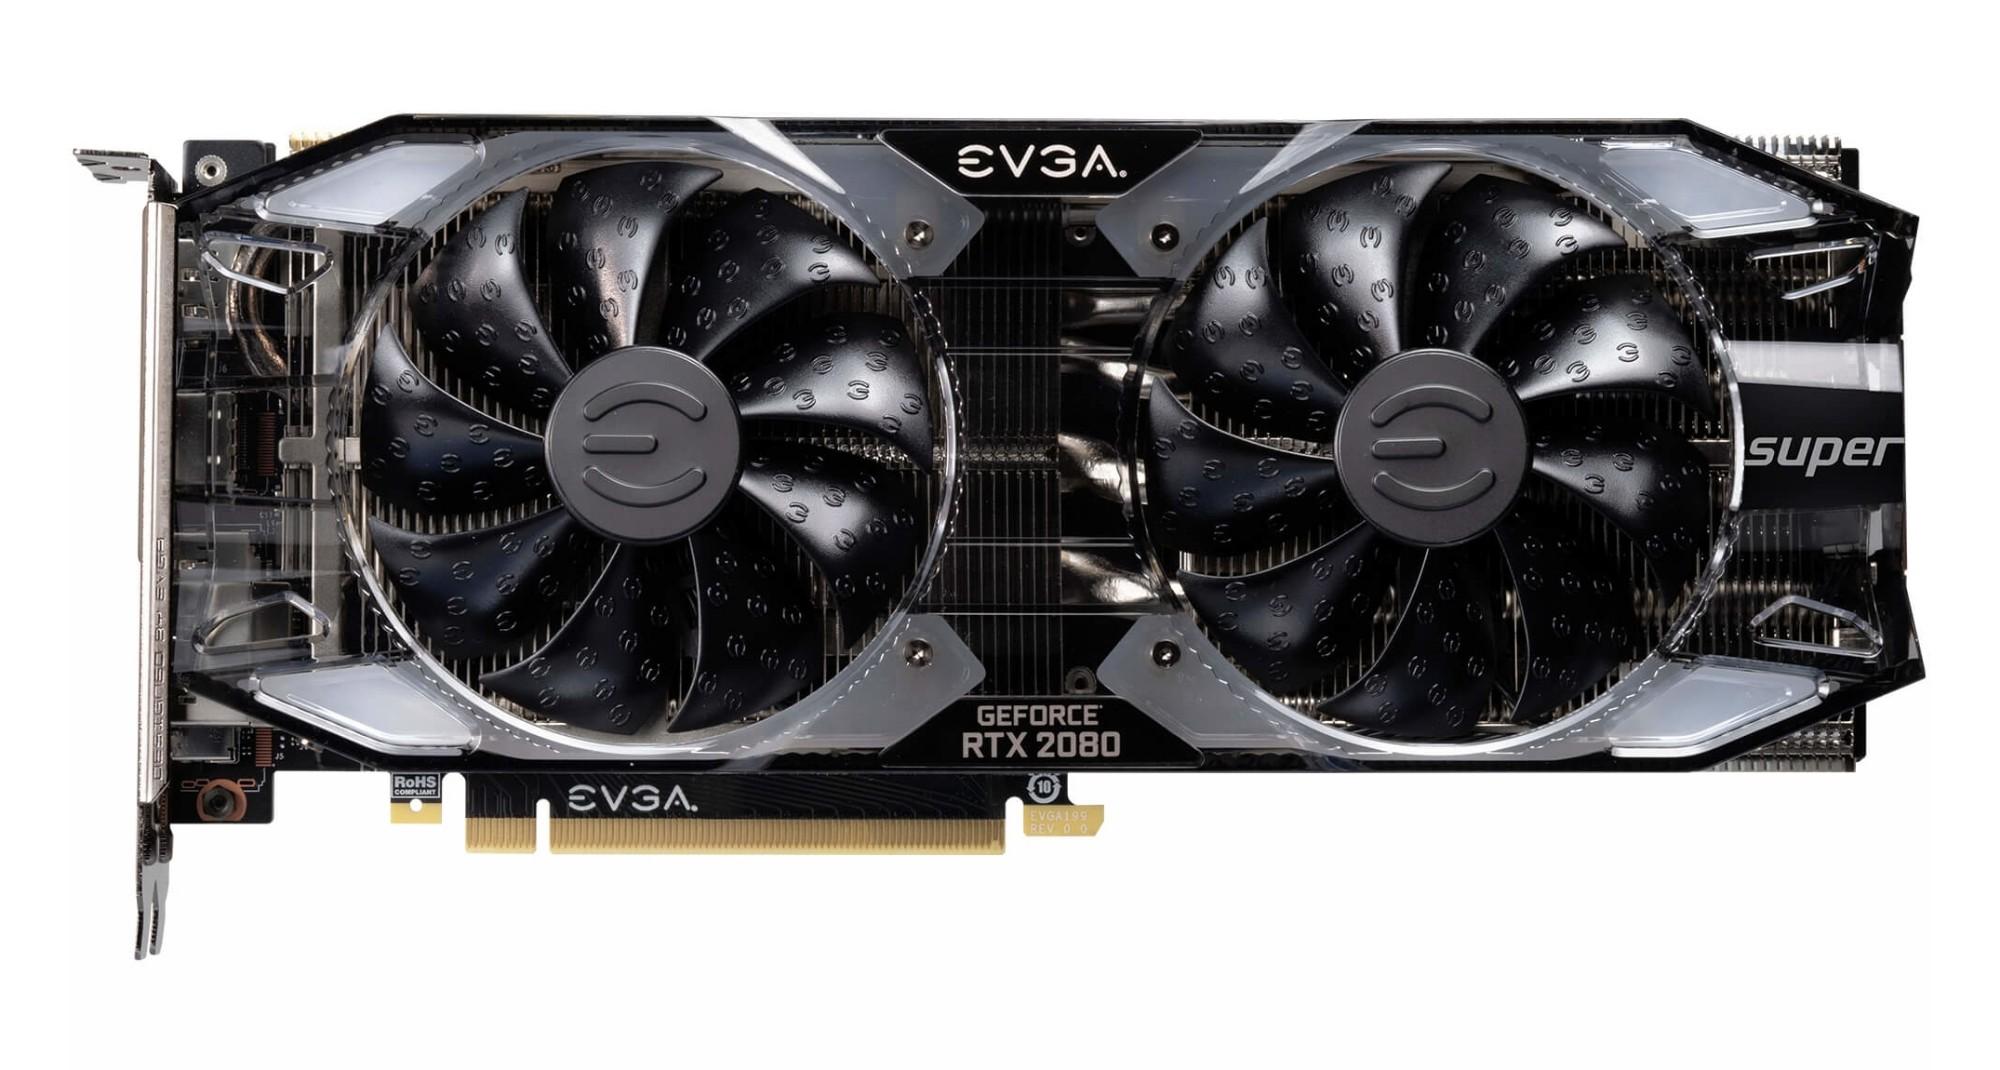 EVGA 08G-P4-3182-KR graphics card GeForce RTX 2080 SUPER 8 GB GDDR6